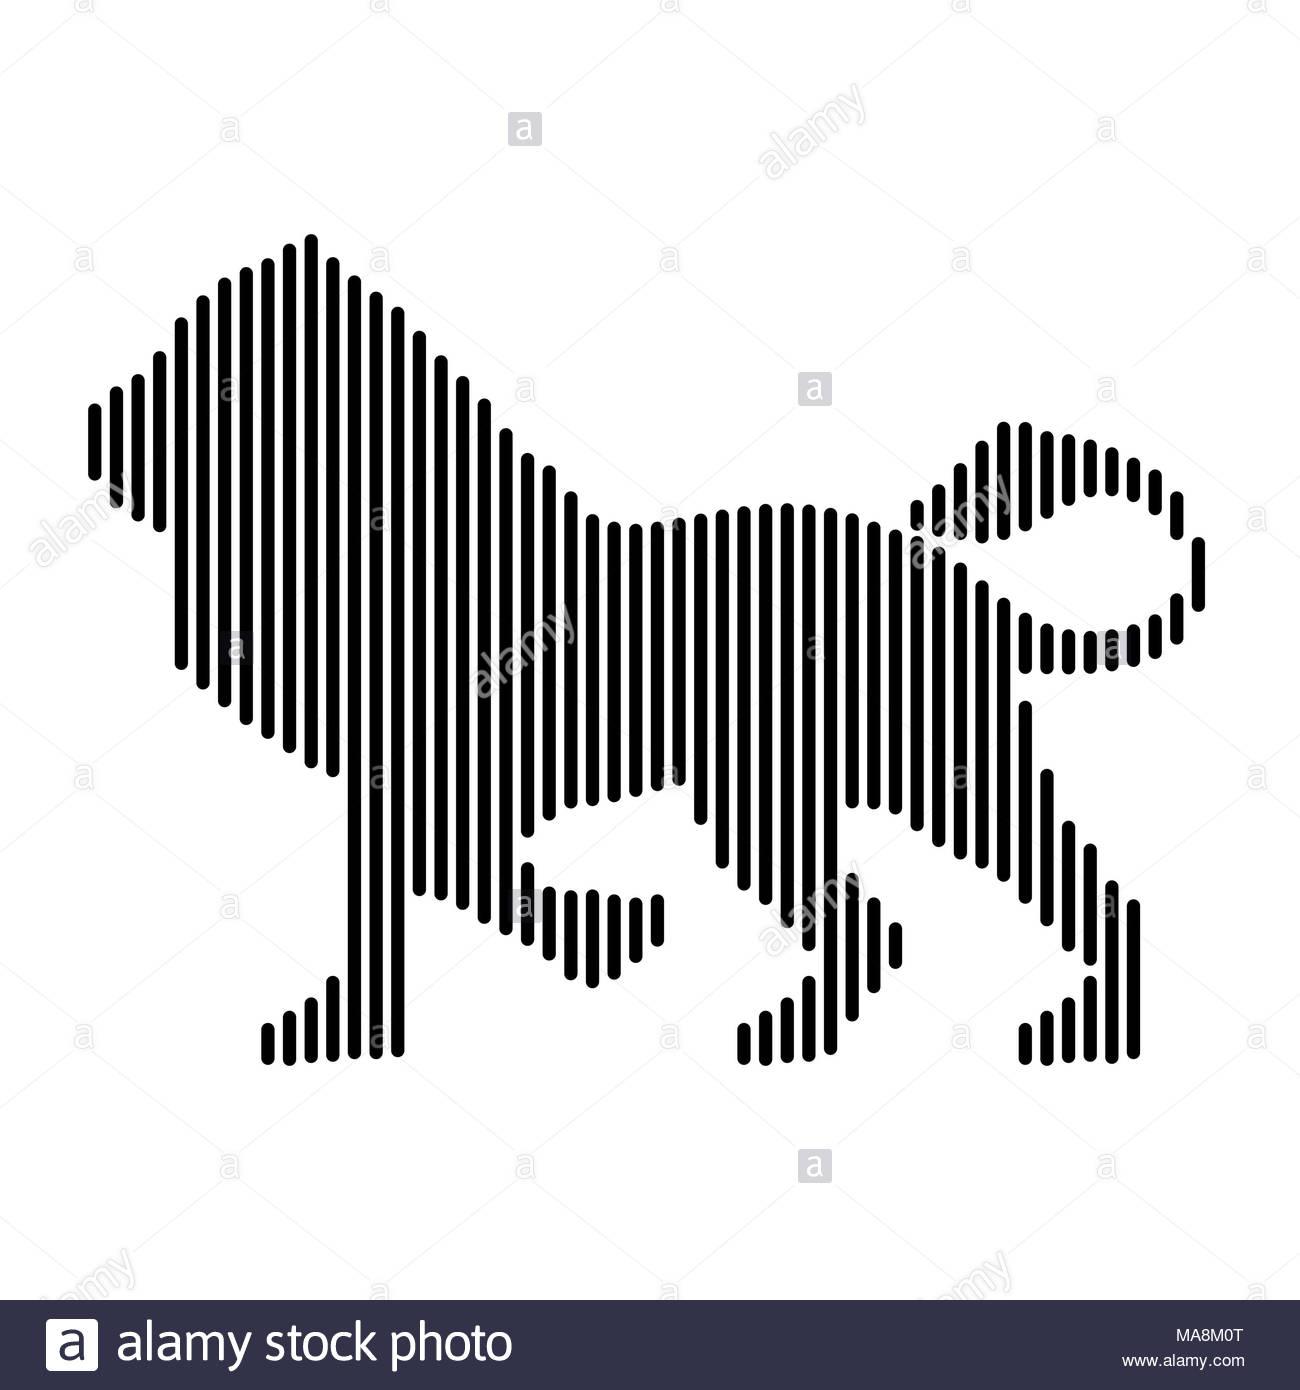 Lion The King Of Beasts Symbols Stock Photo 178441560 Alamy